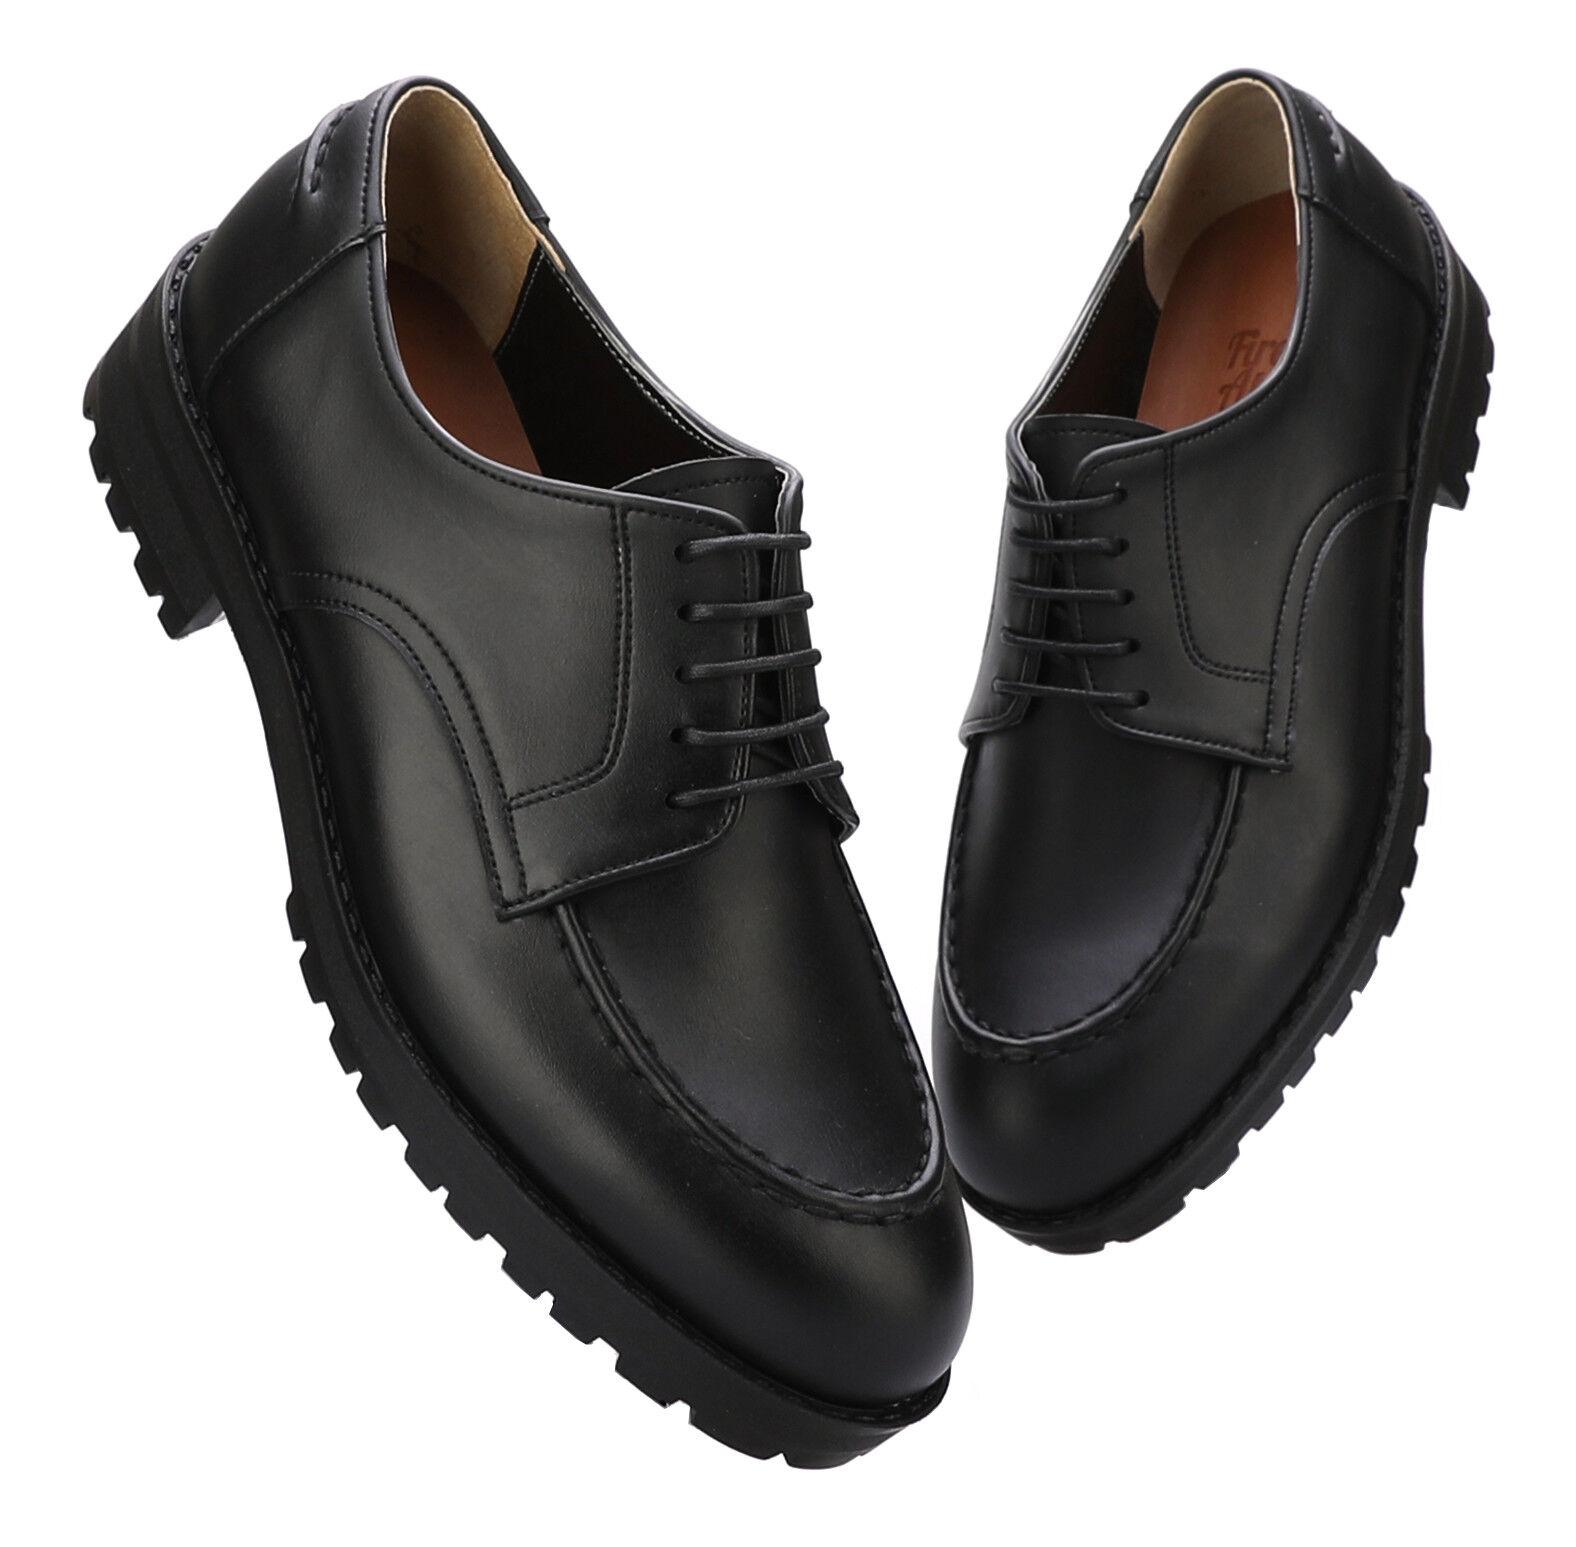 Firenze Atelier Homme fait à la main en cuir noir U-Tip Moc Toe Derby Derbies